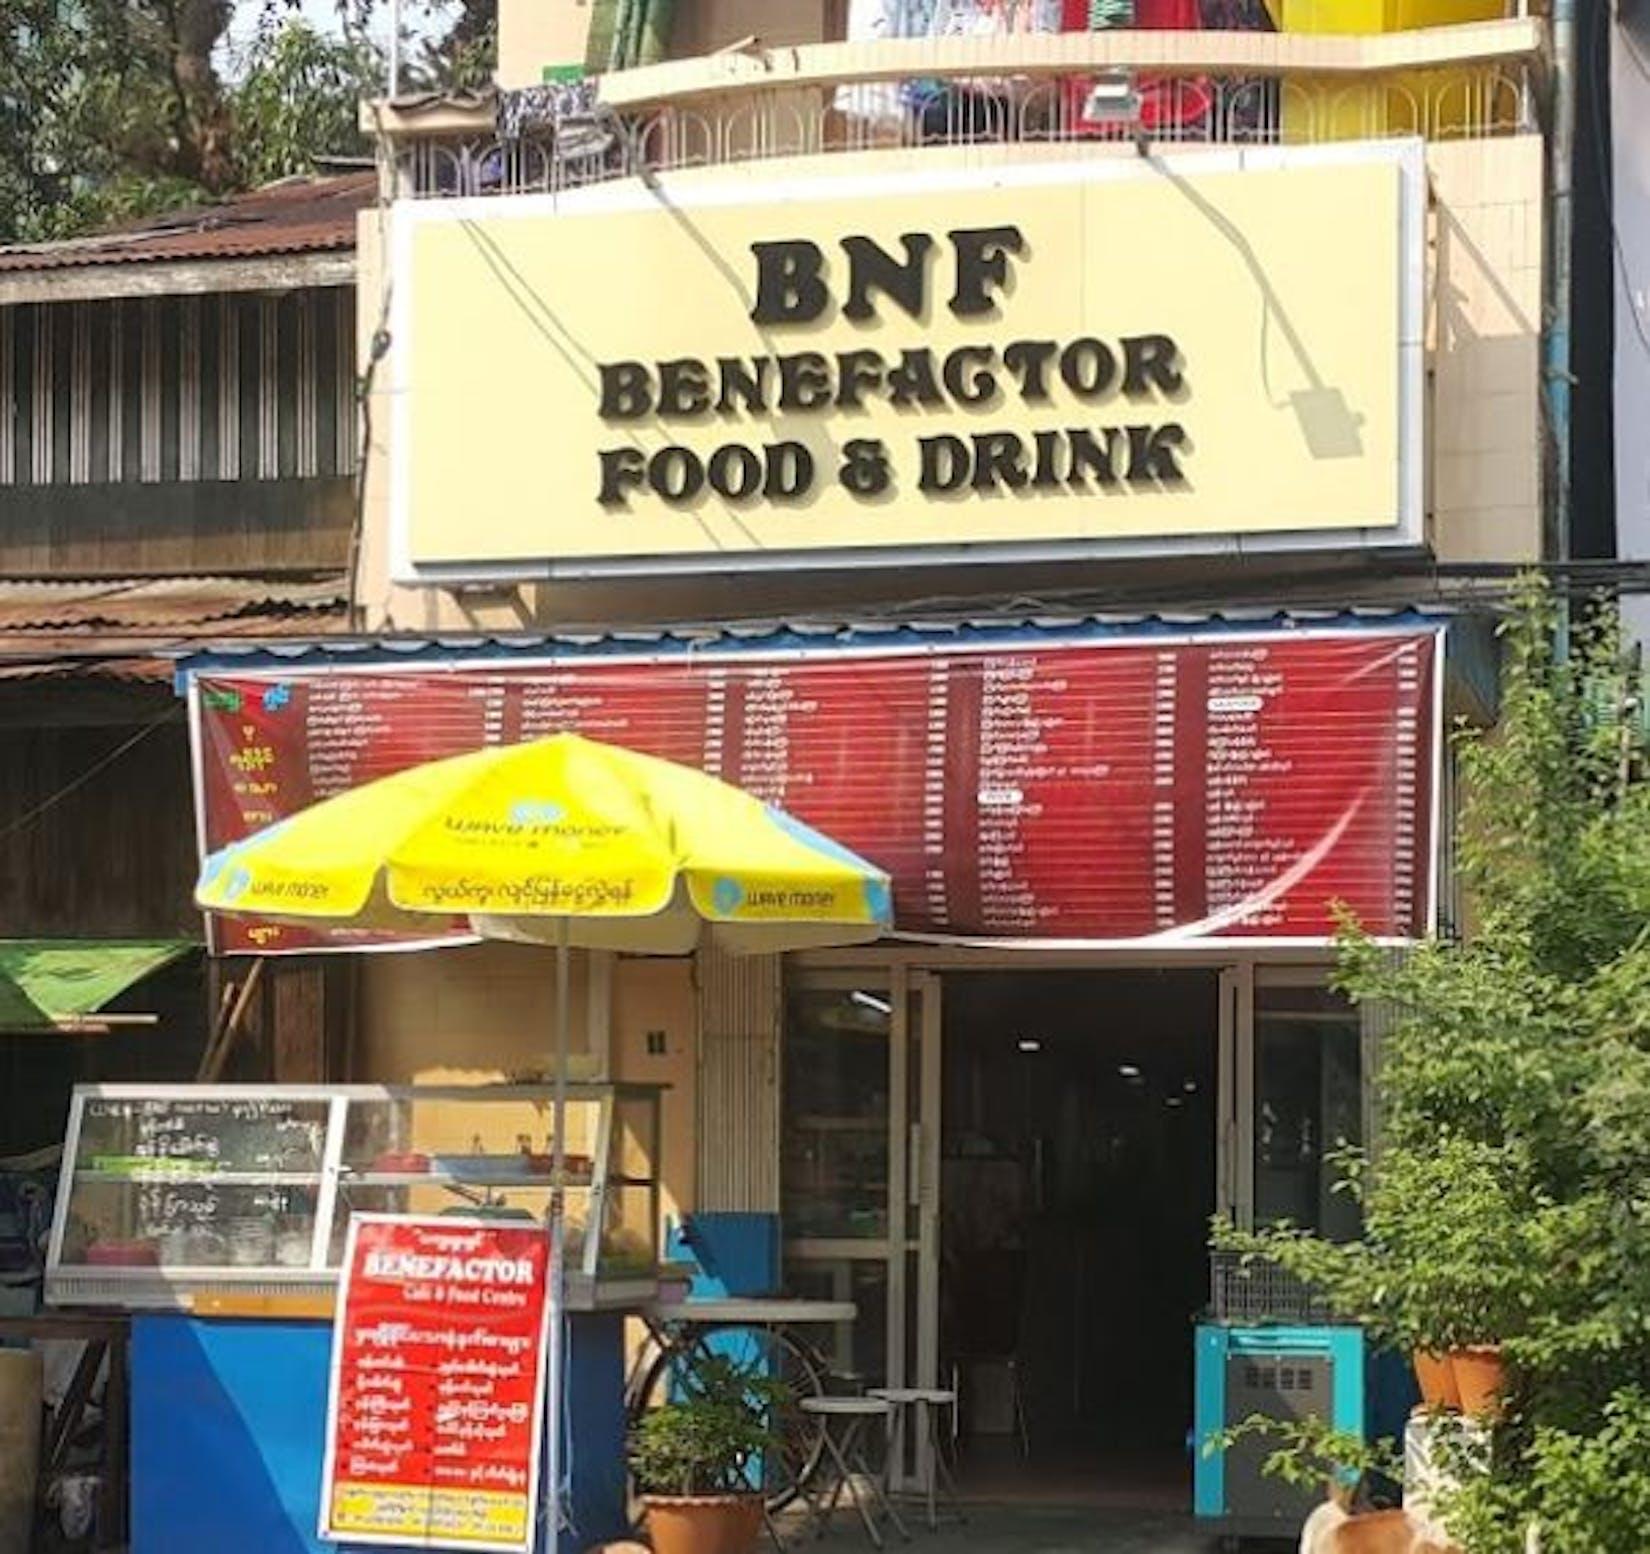 BNF - BENEFACTOR Food & Drink | yathar